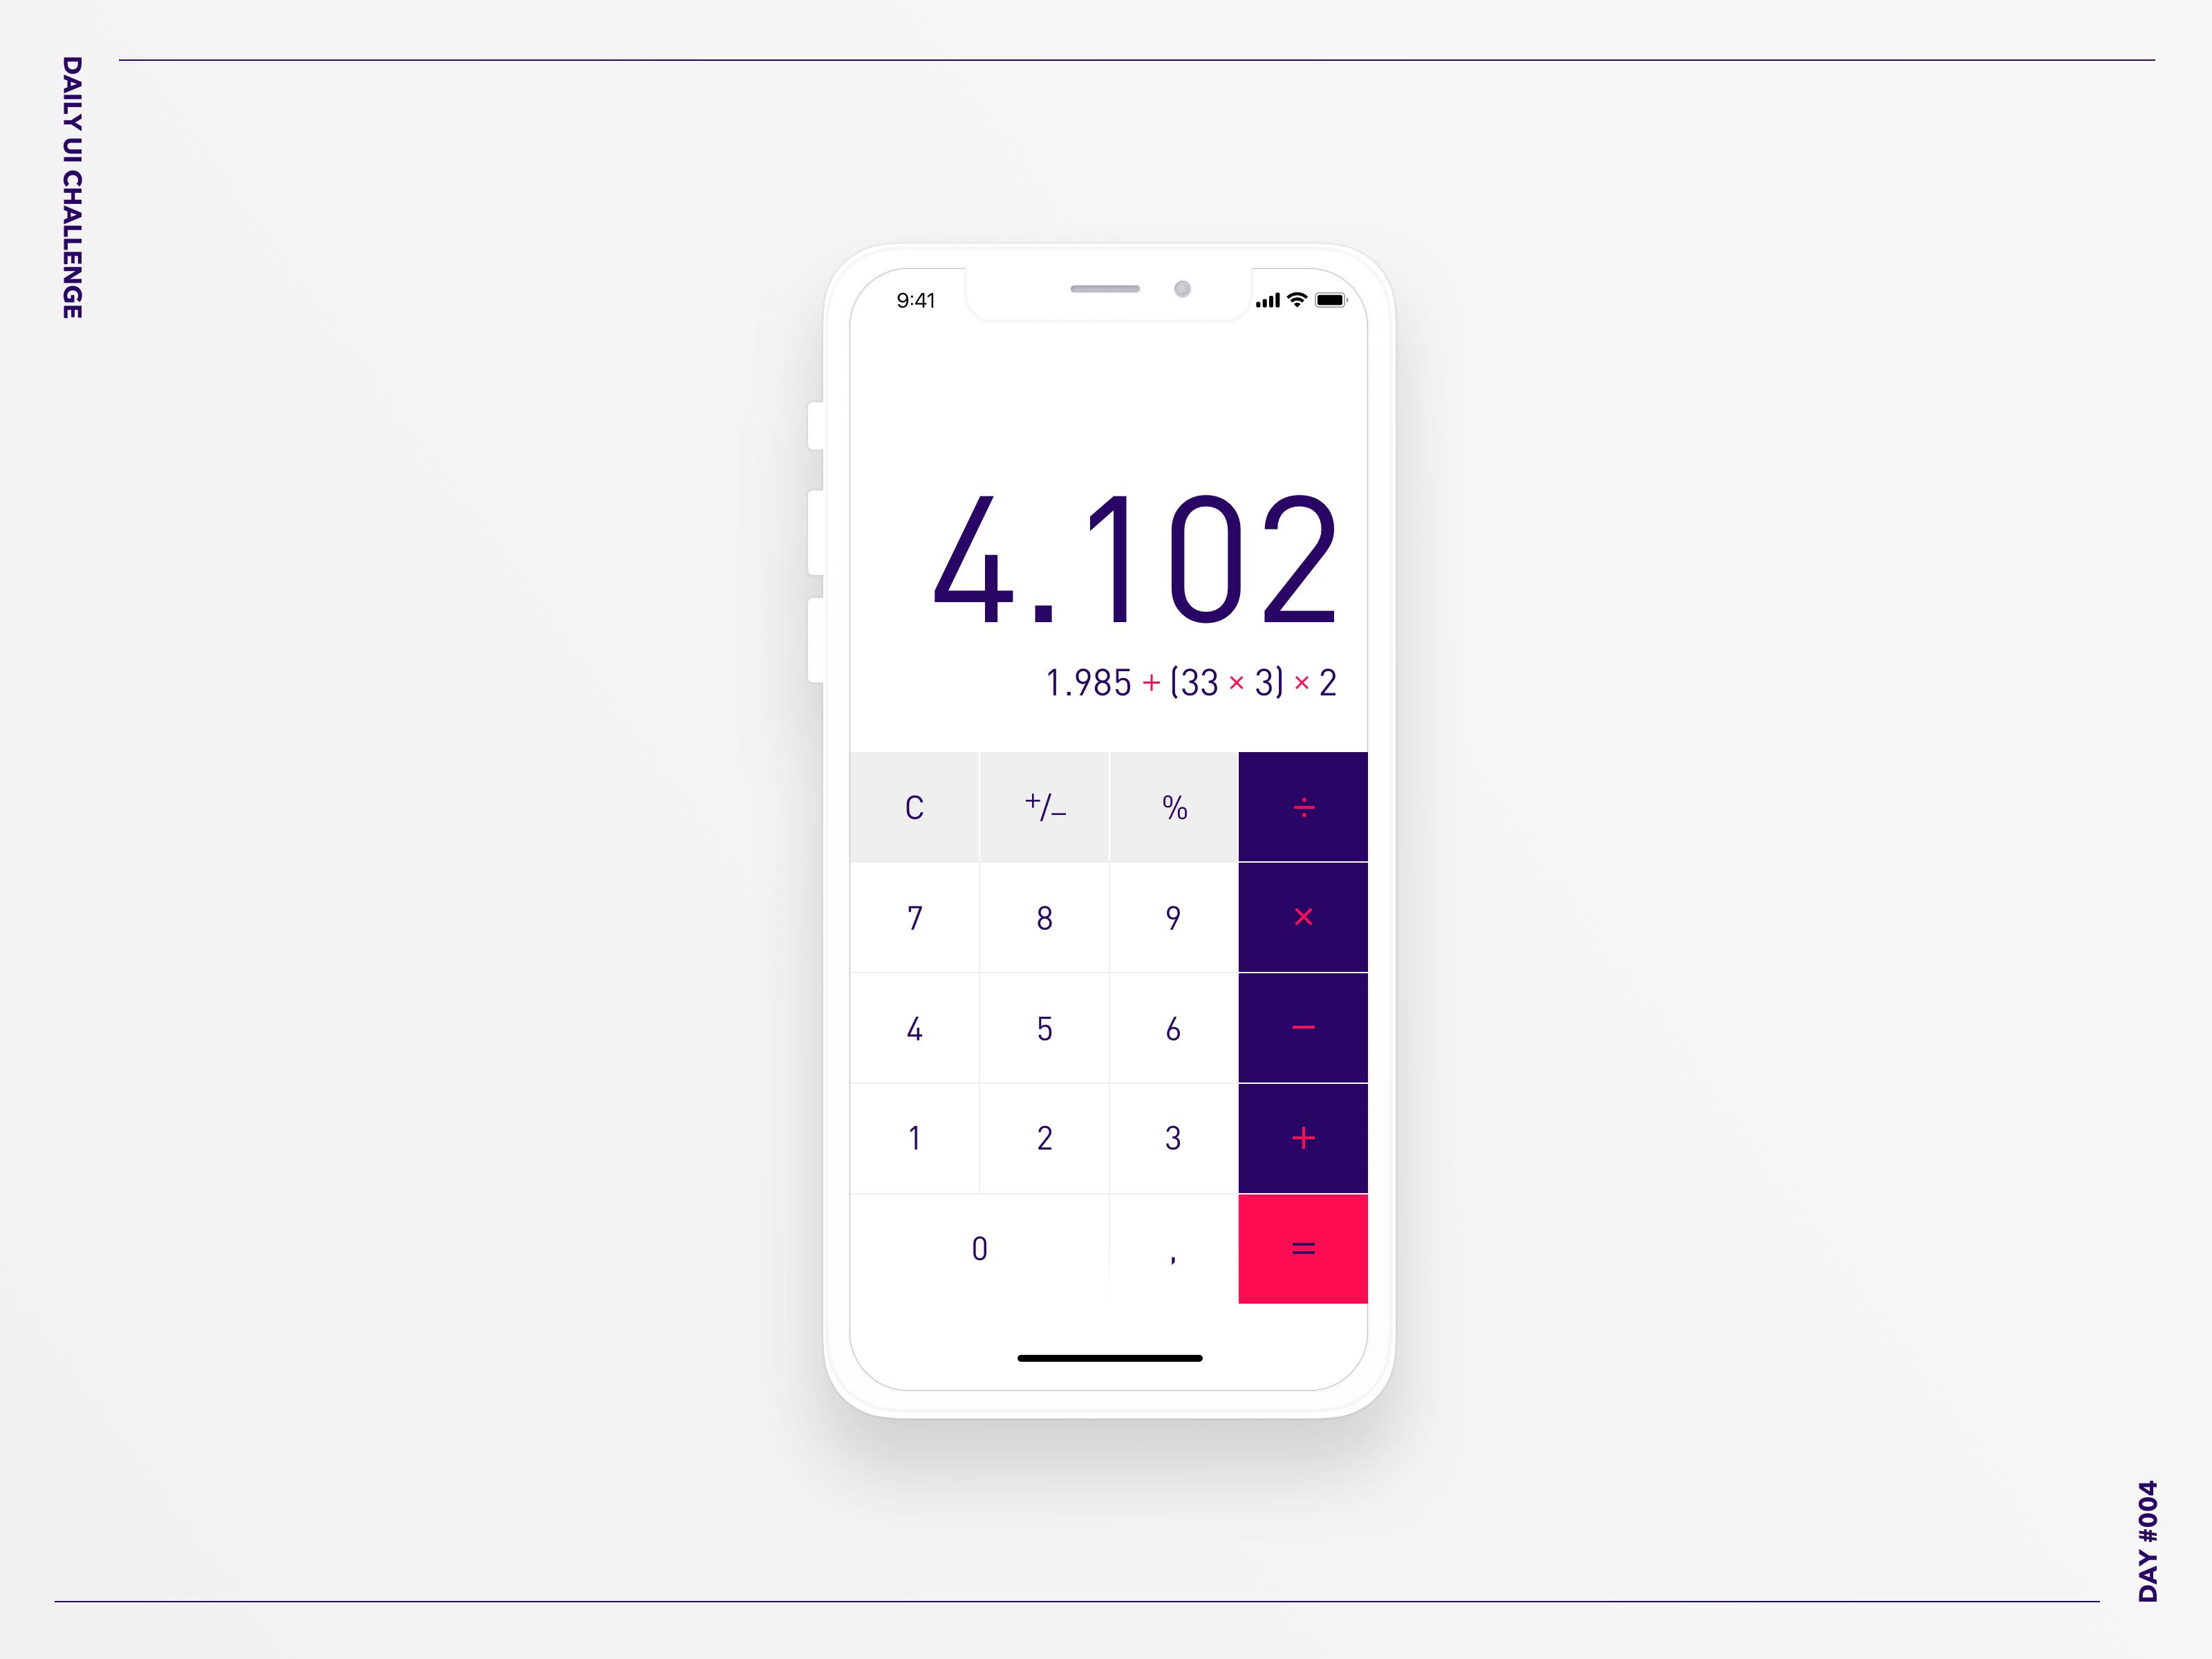 004-DUIC-Calculator-Dribbble-1